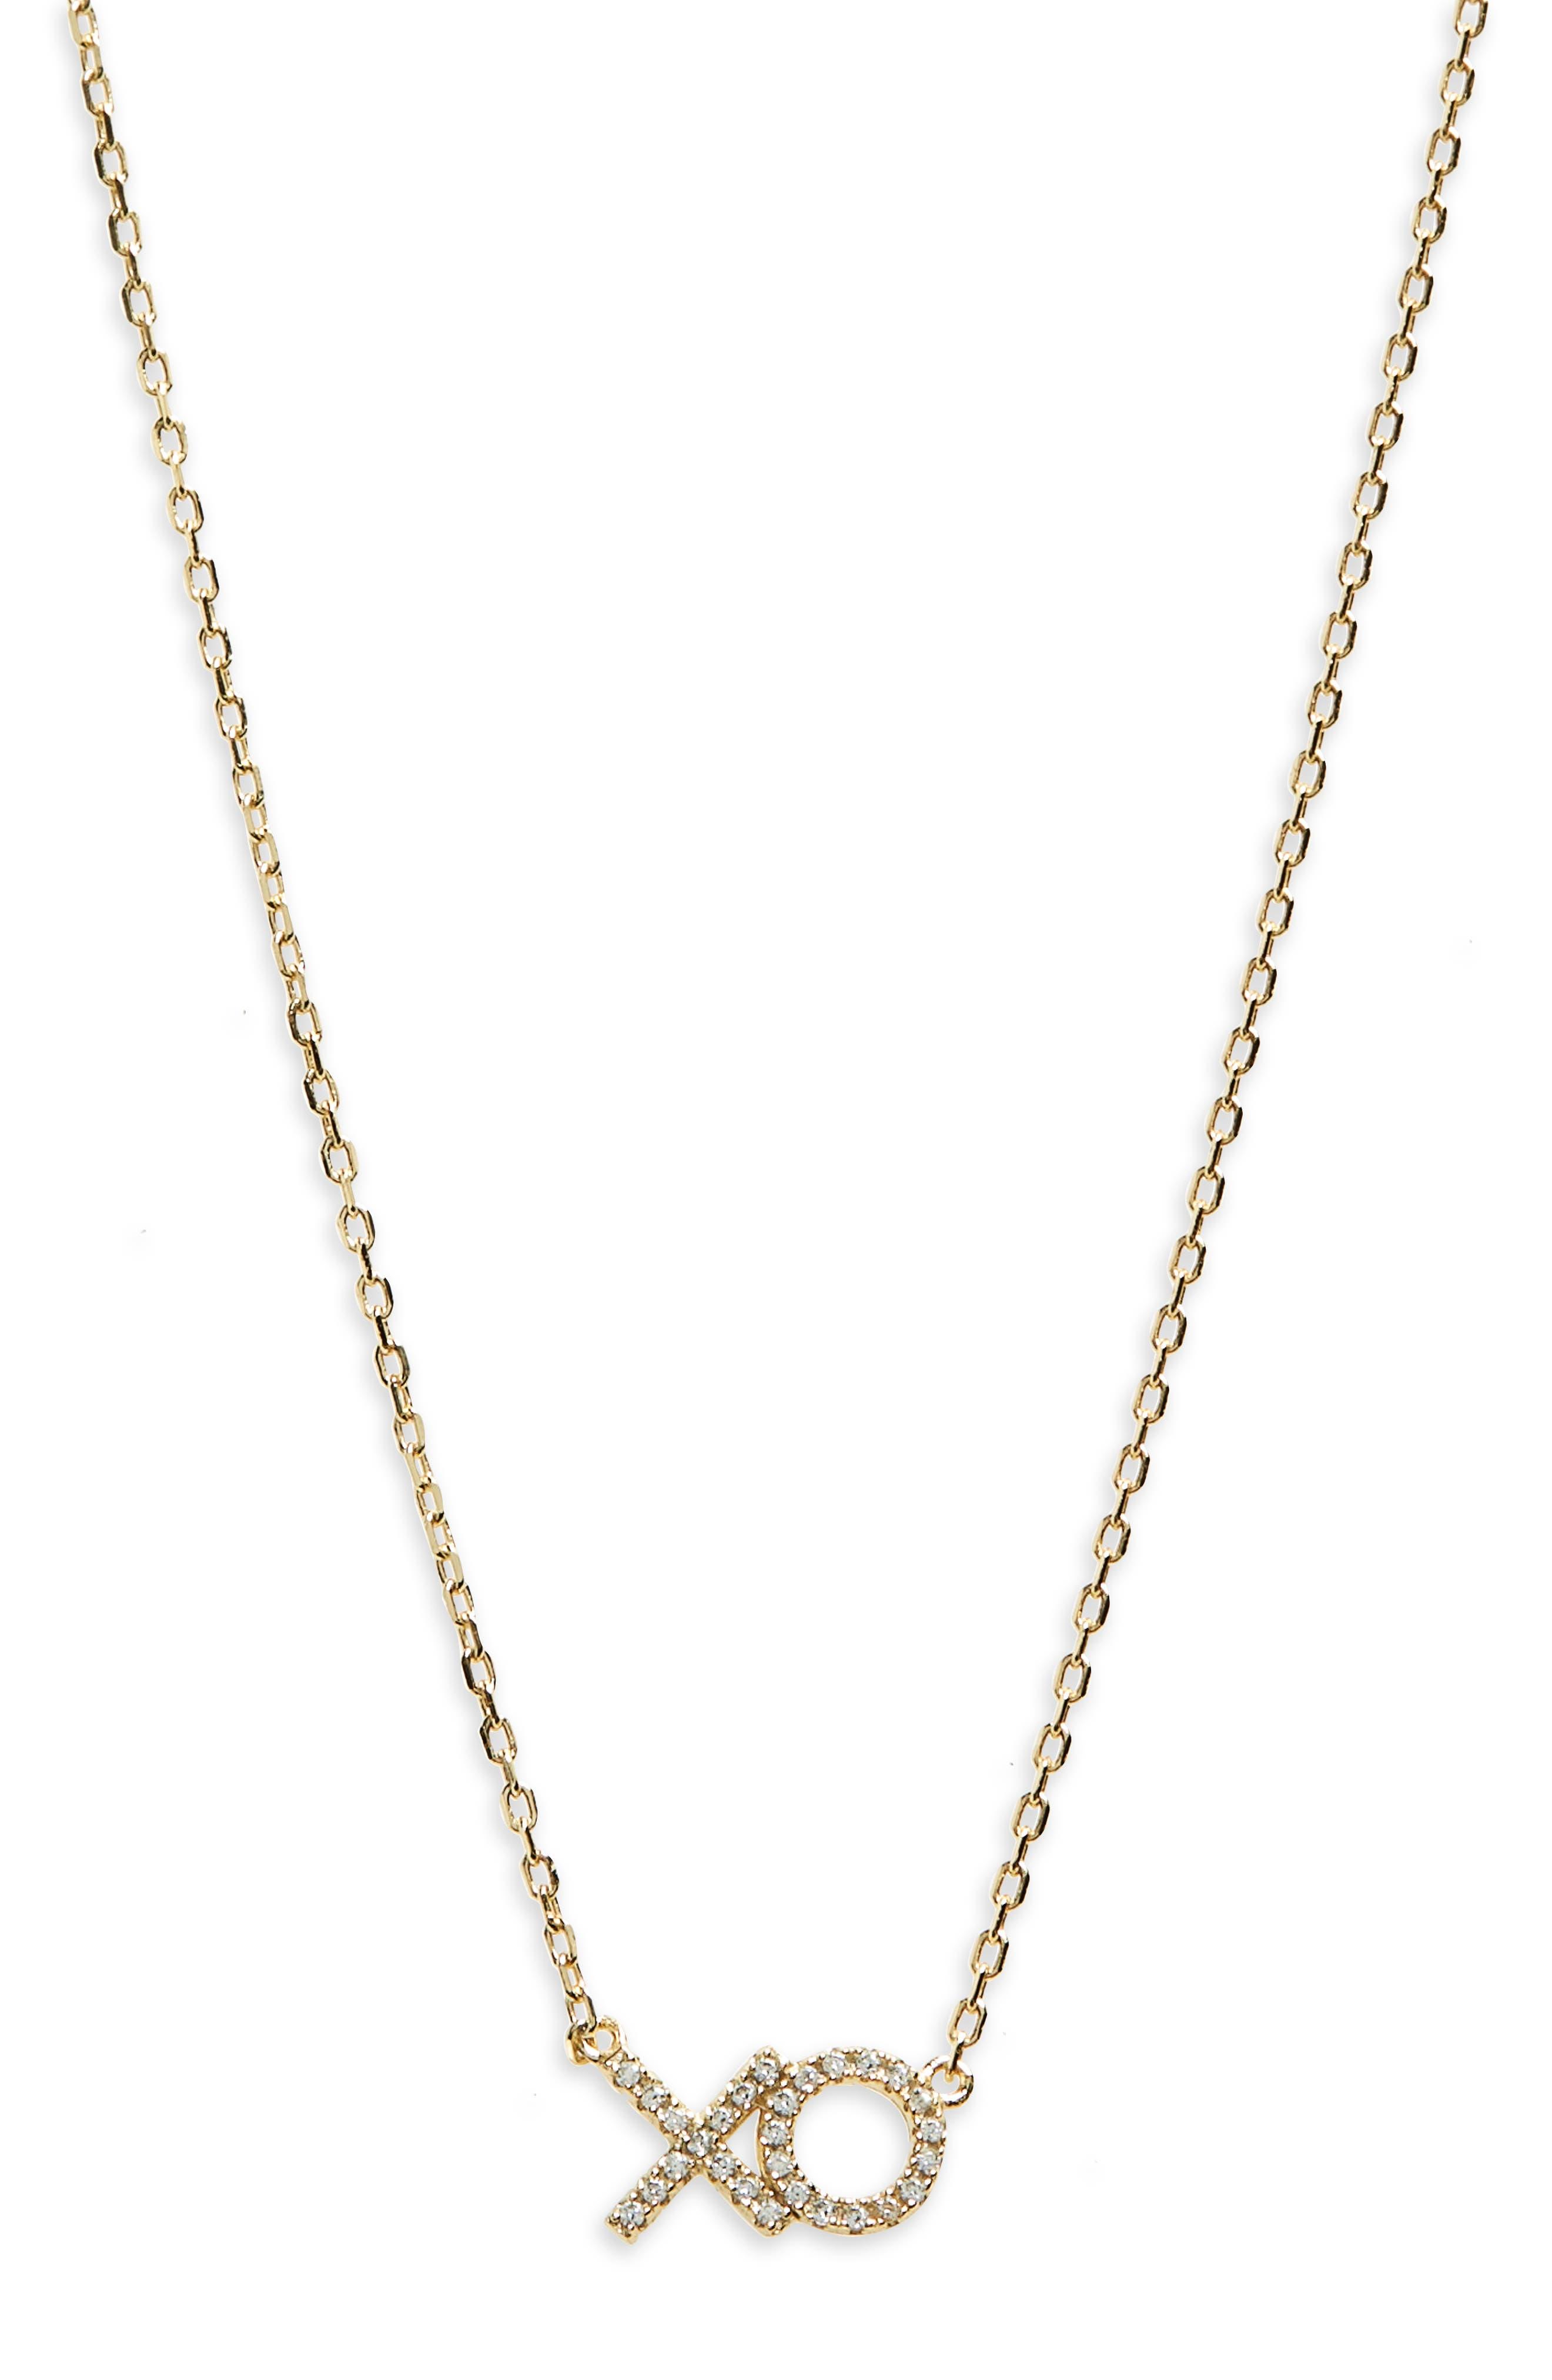 XO Pavé Pendant Necklace,                         Main,                         color, Yellow Gold